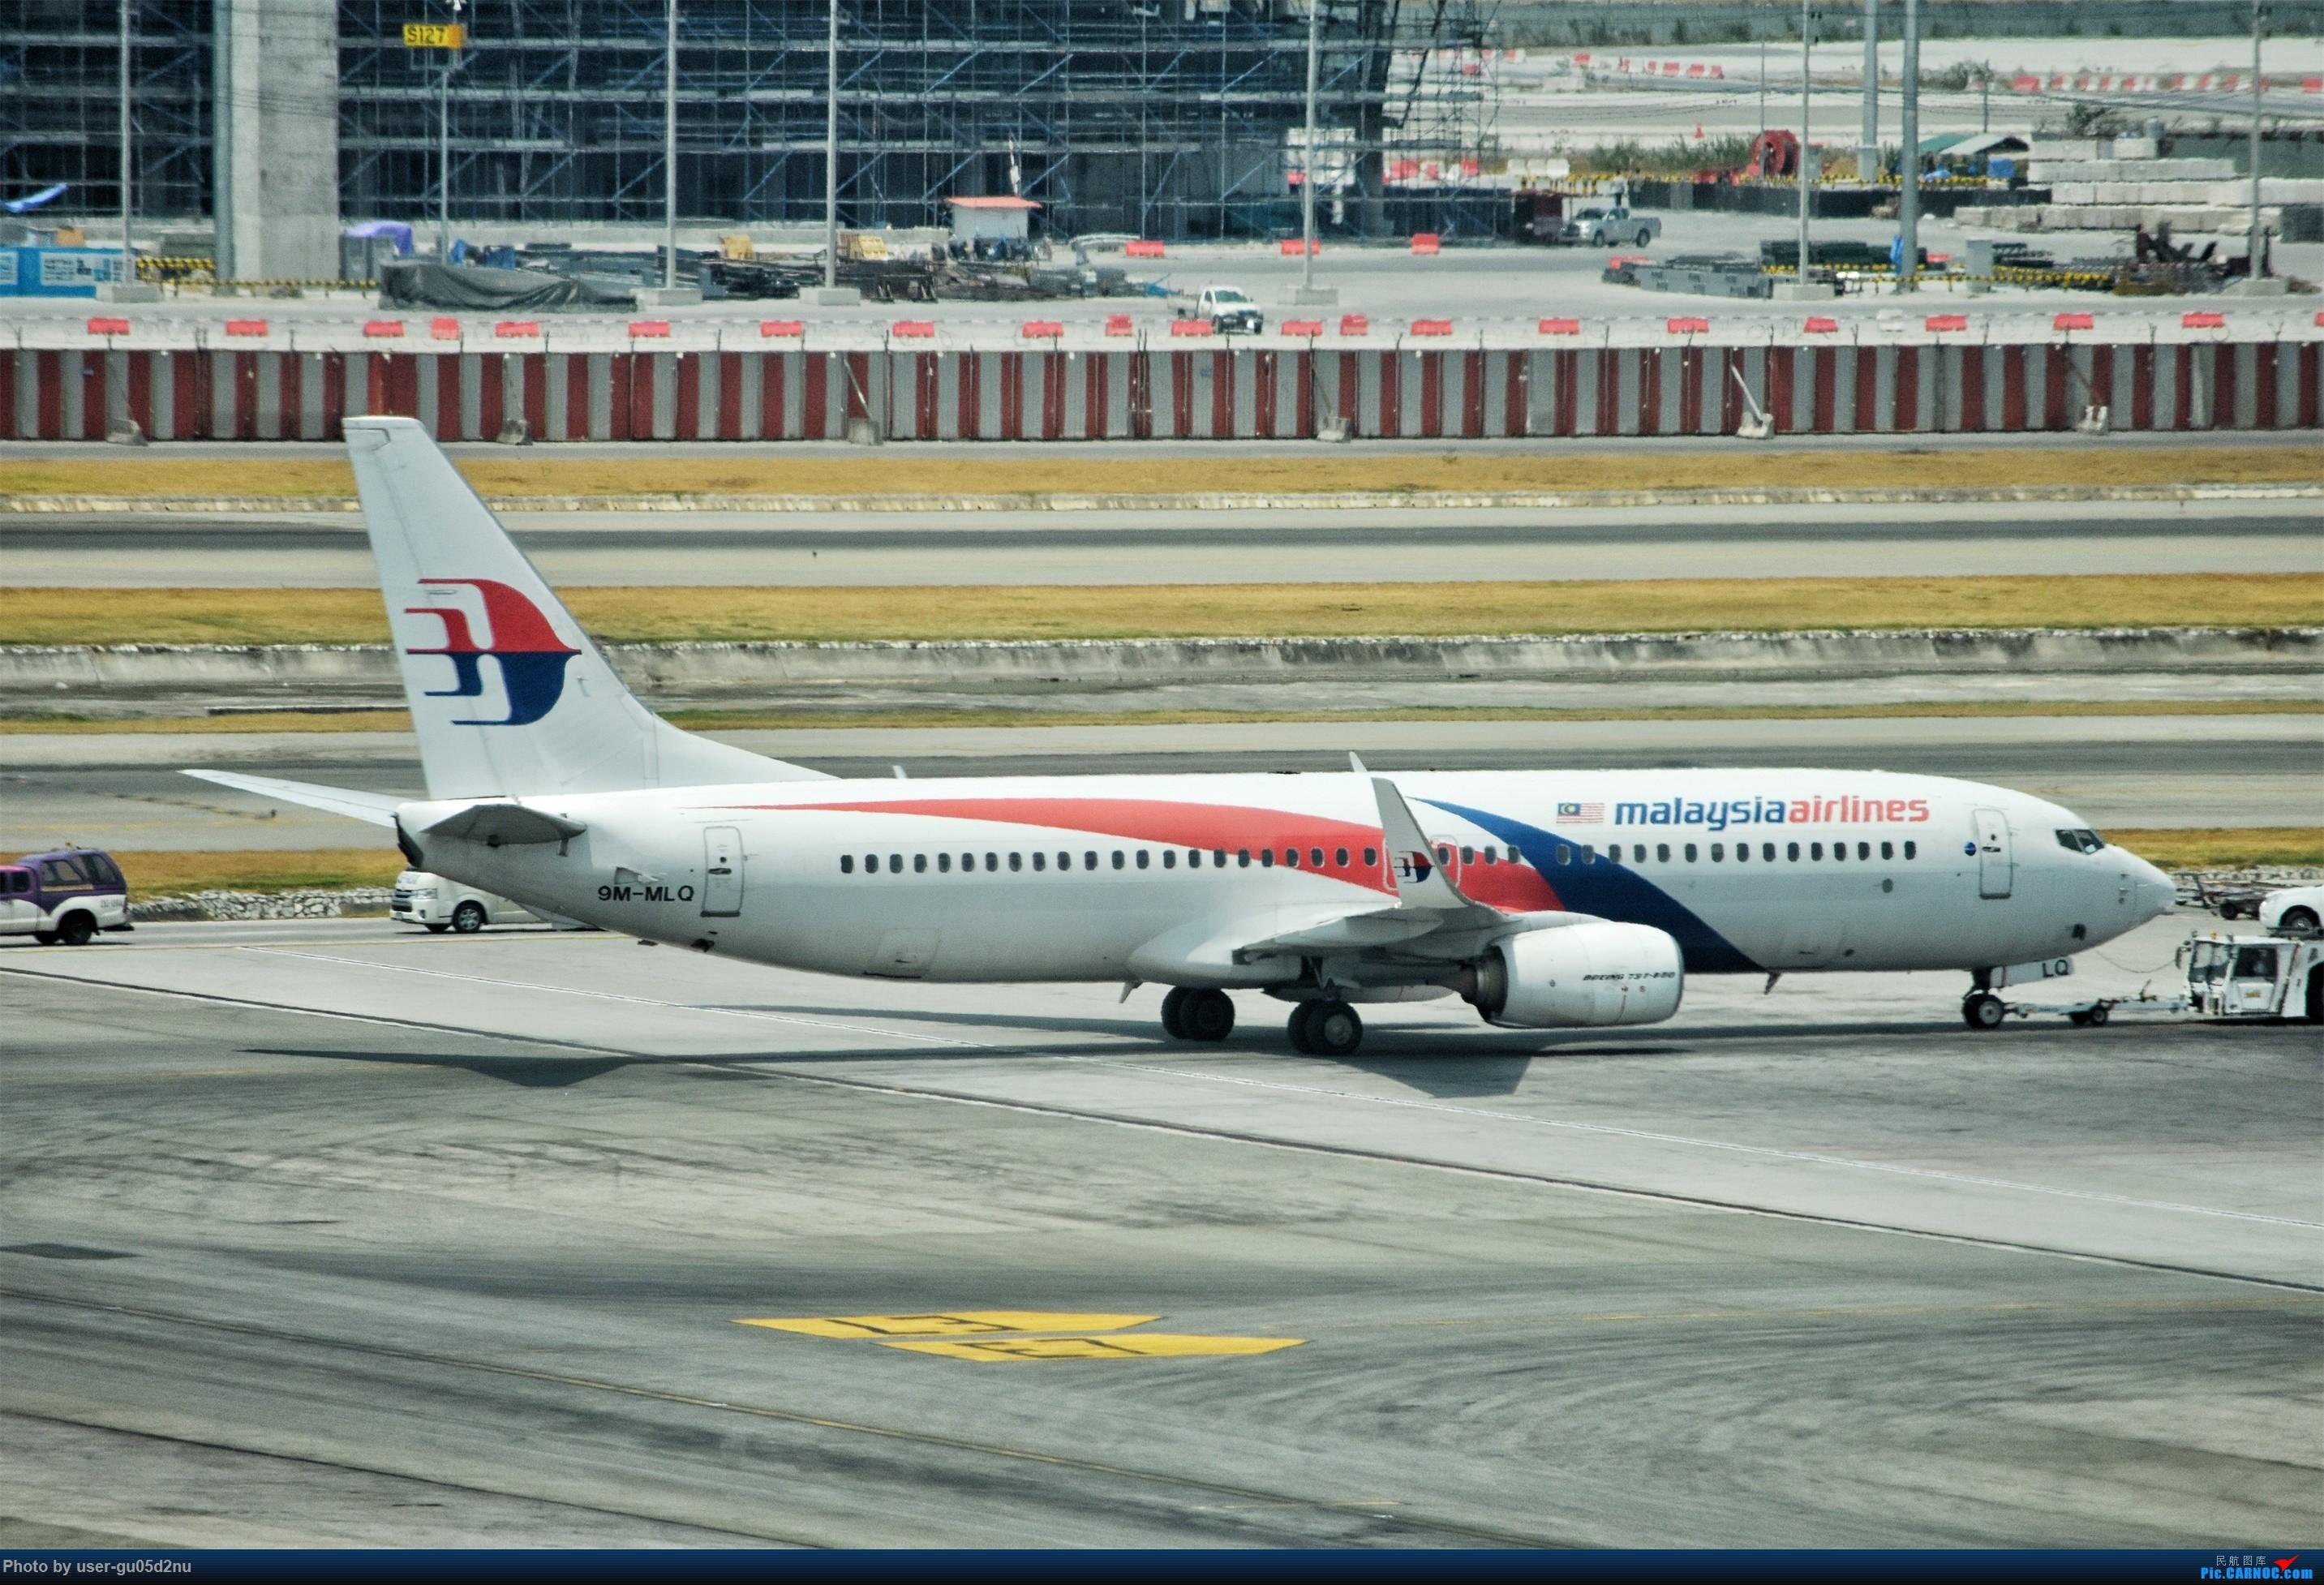 Re:[原创]曼谷素万那普观景平台视角【滑行篇】 BOEING 737-800 9M-MLQ Suvarnabhumi Airport